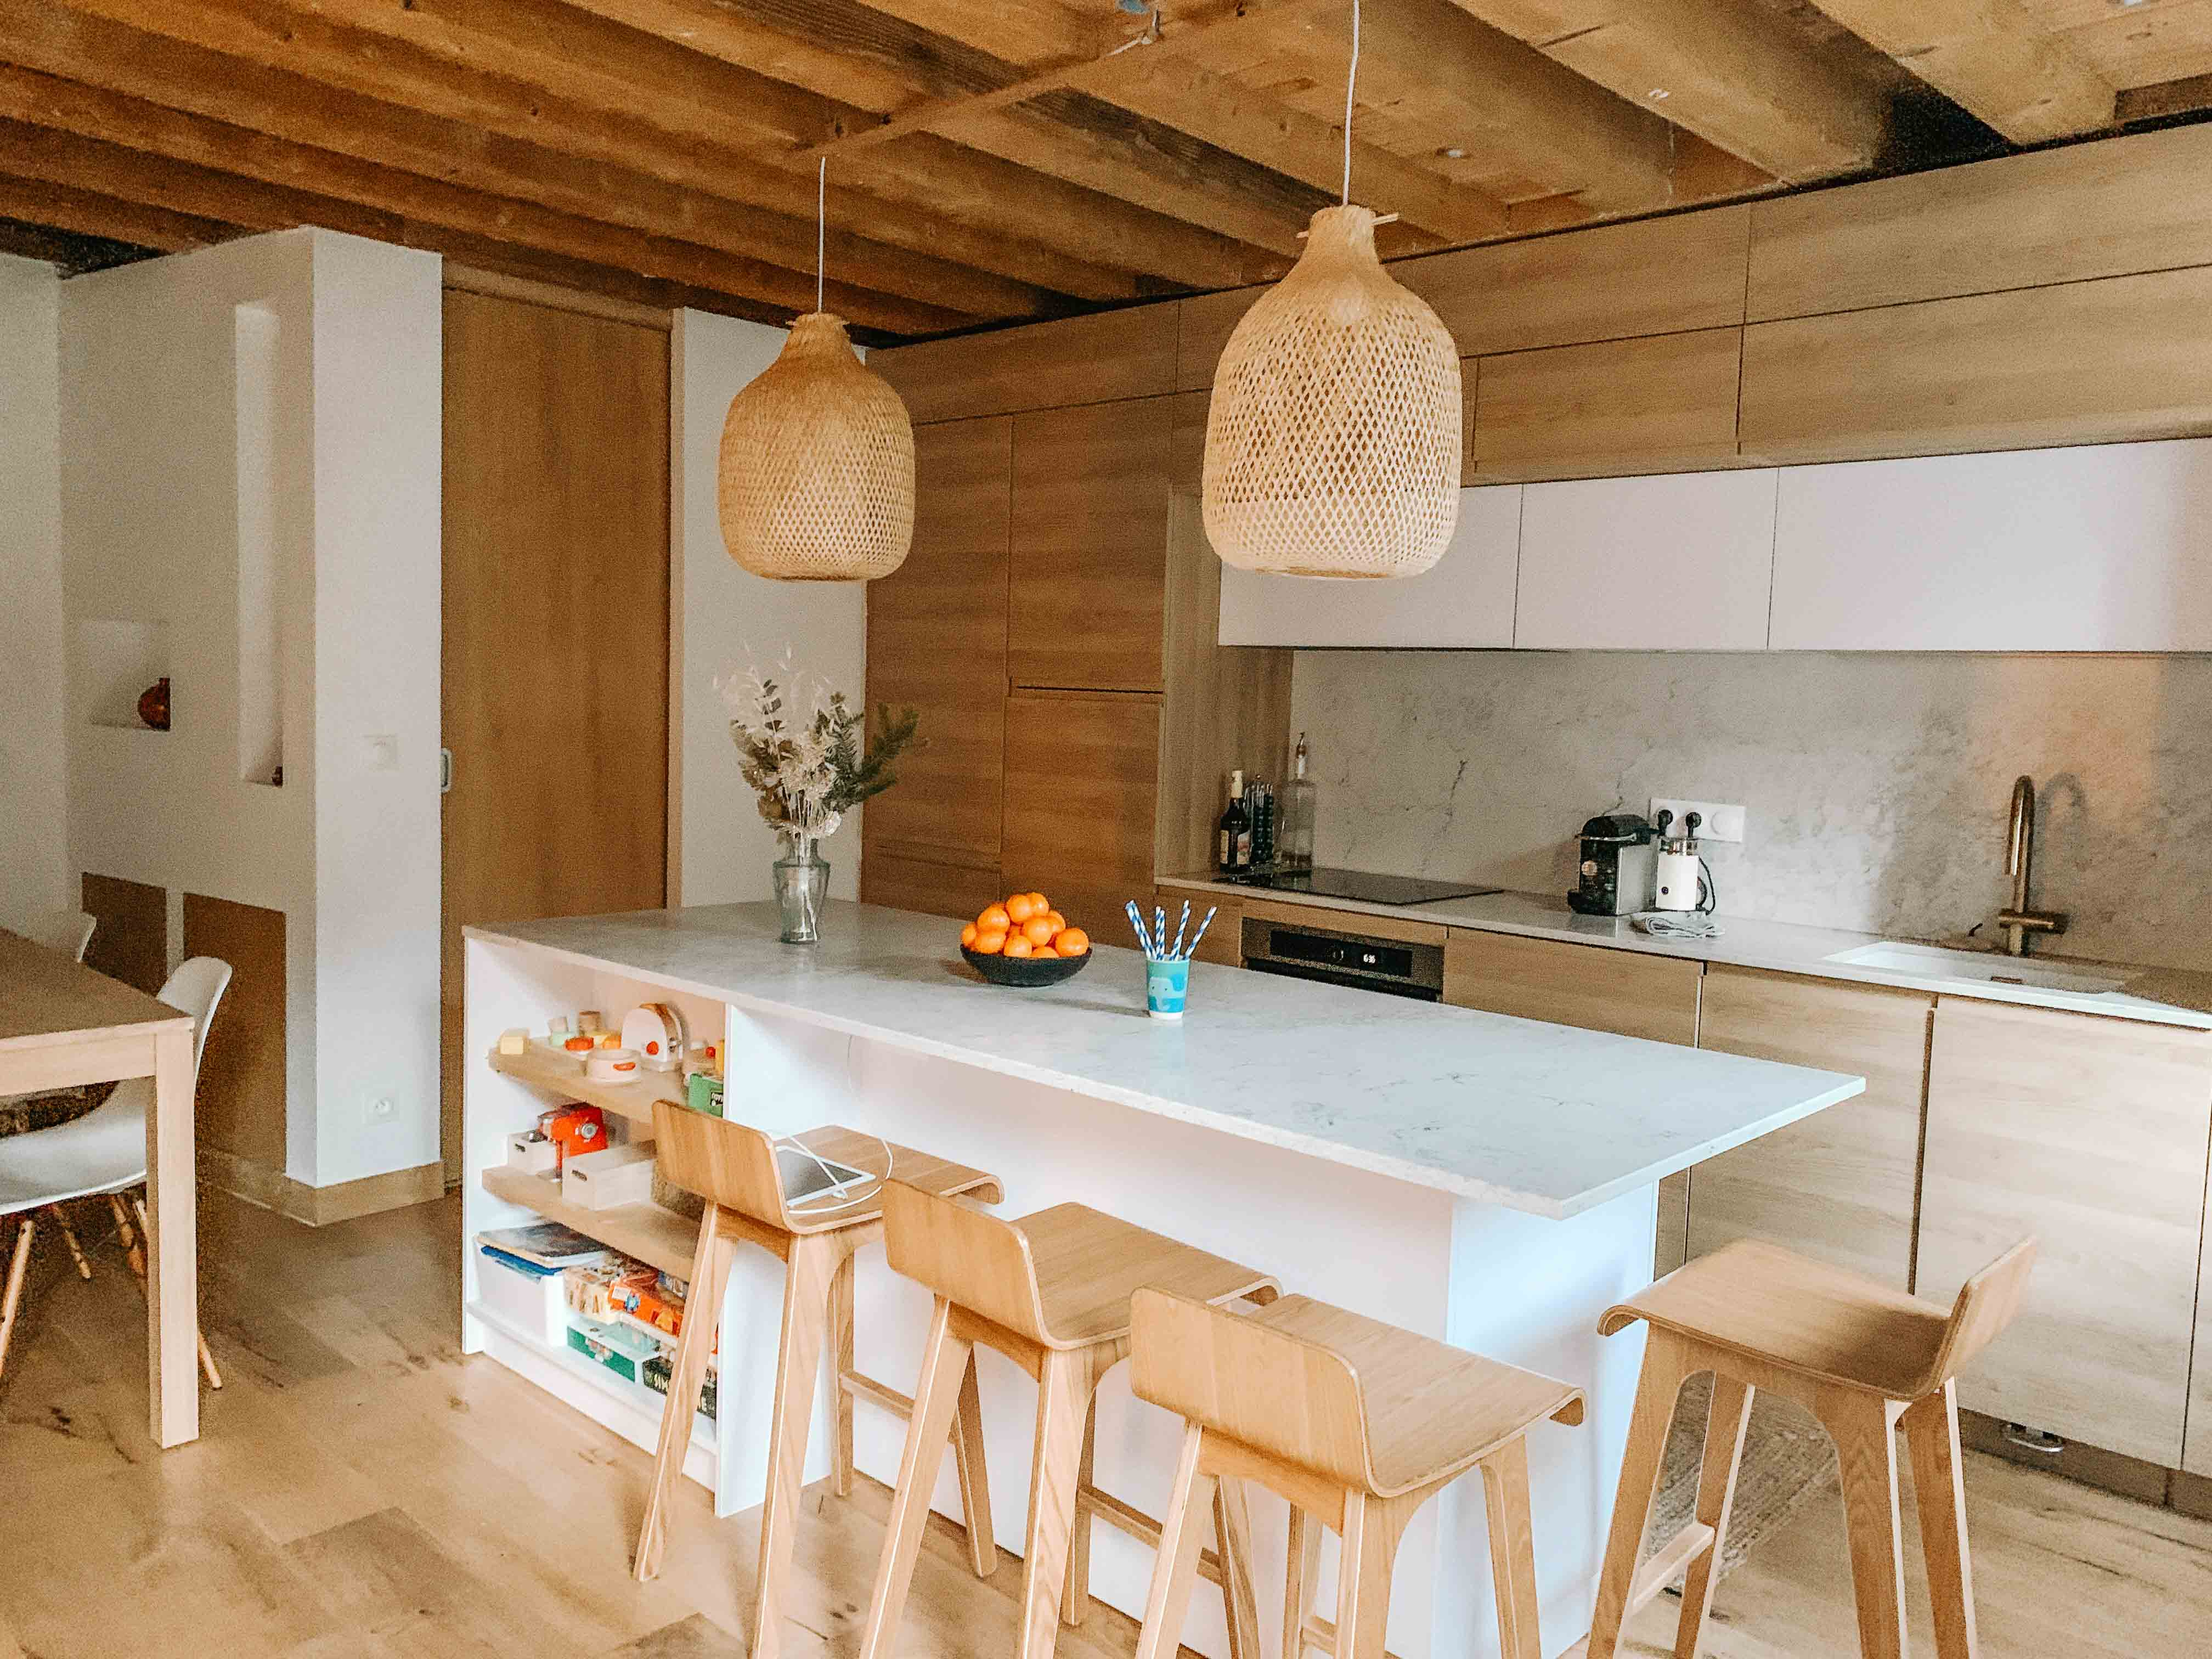 architecte-lyon-rénovation-presbytere-marcilly-azergues-pierre-dorée-31